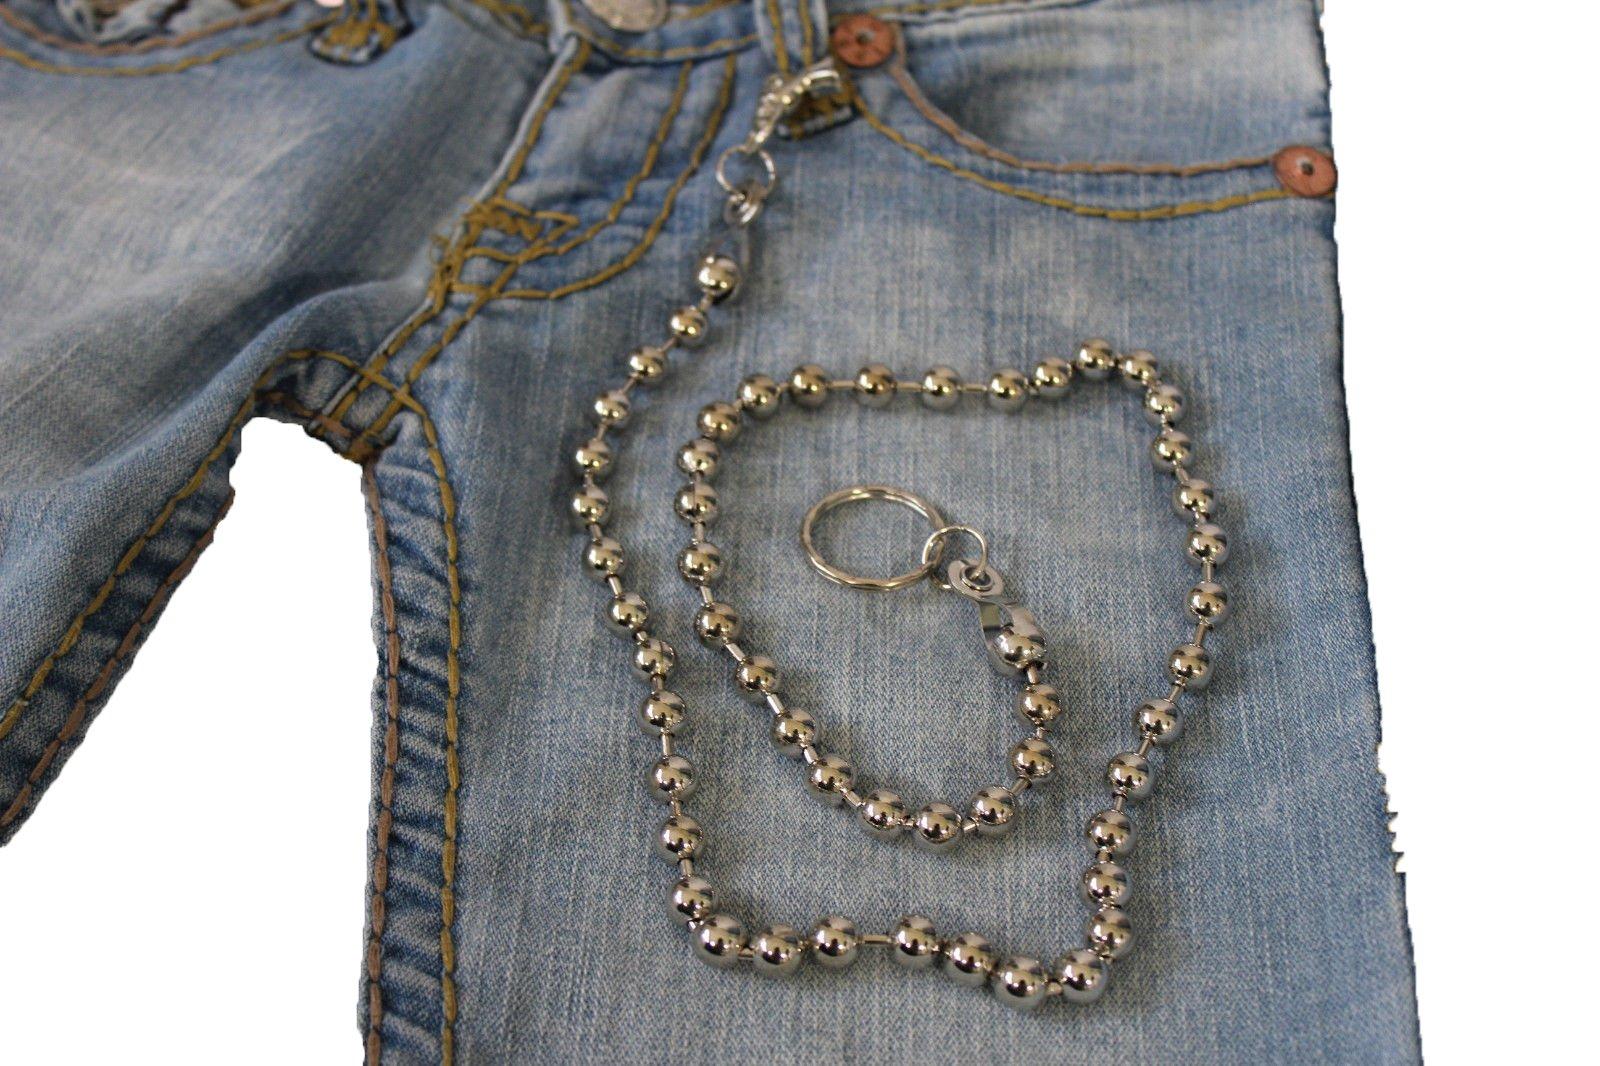 TFJ Men's Fashion Wallet Chain Big Metal Balls Extra Long 34 Inches (silver)